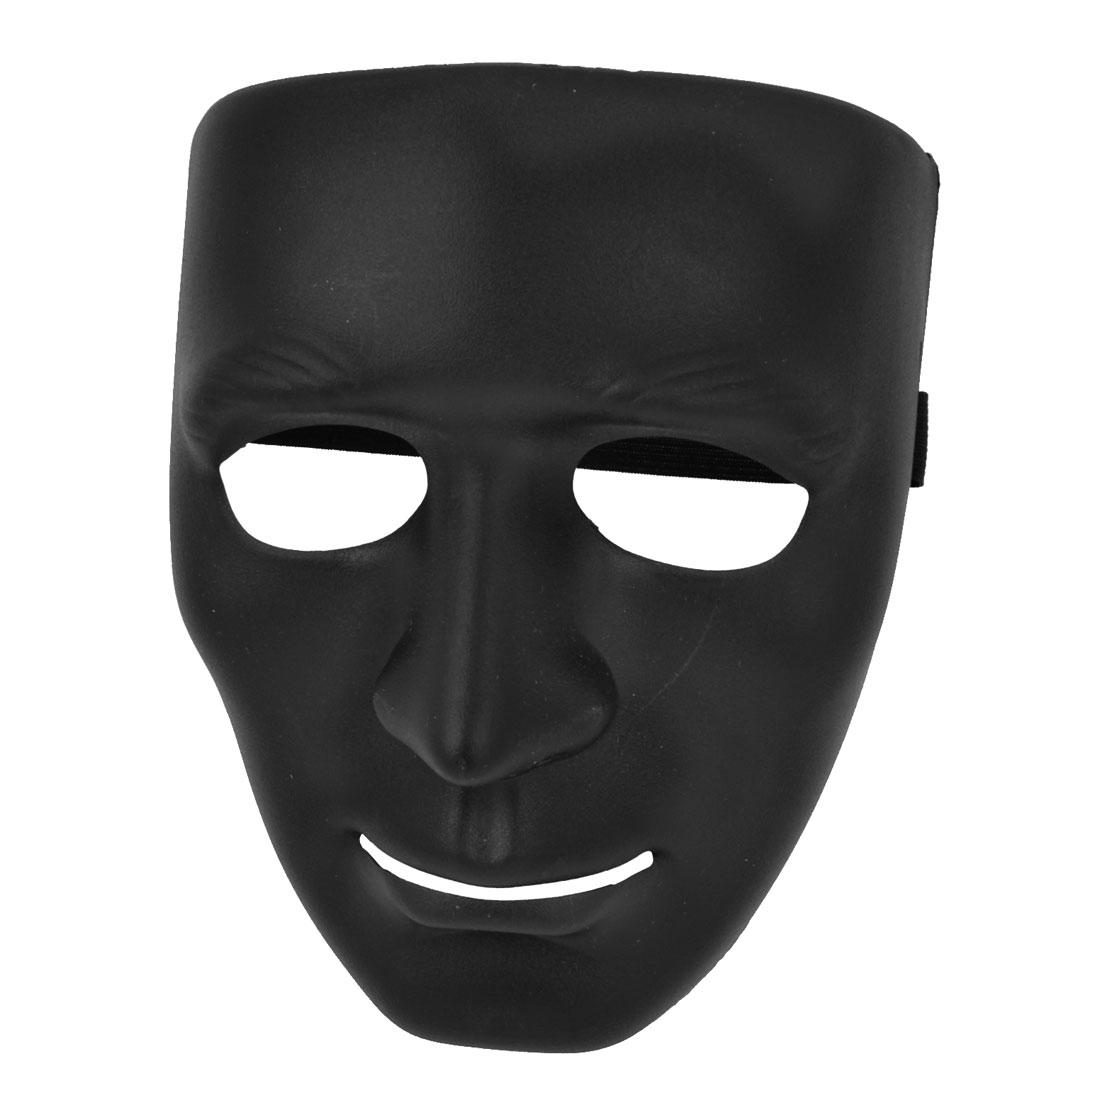 Airsoft War Game Black Plastic Full Face Plain Mask for Man